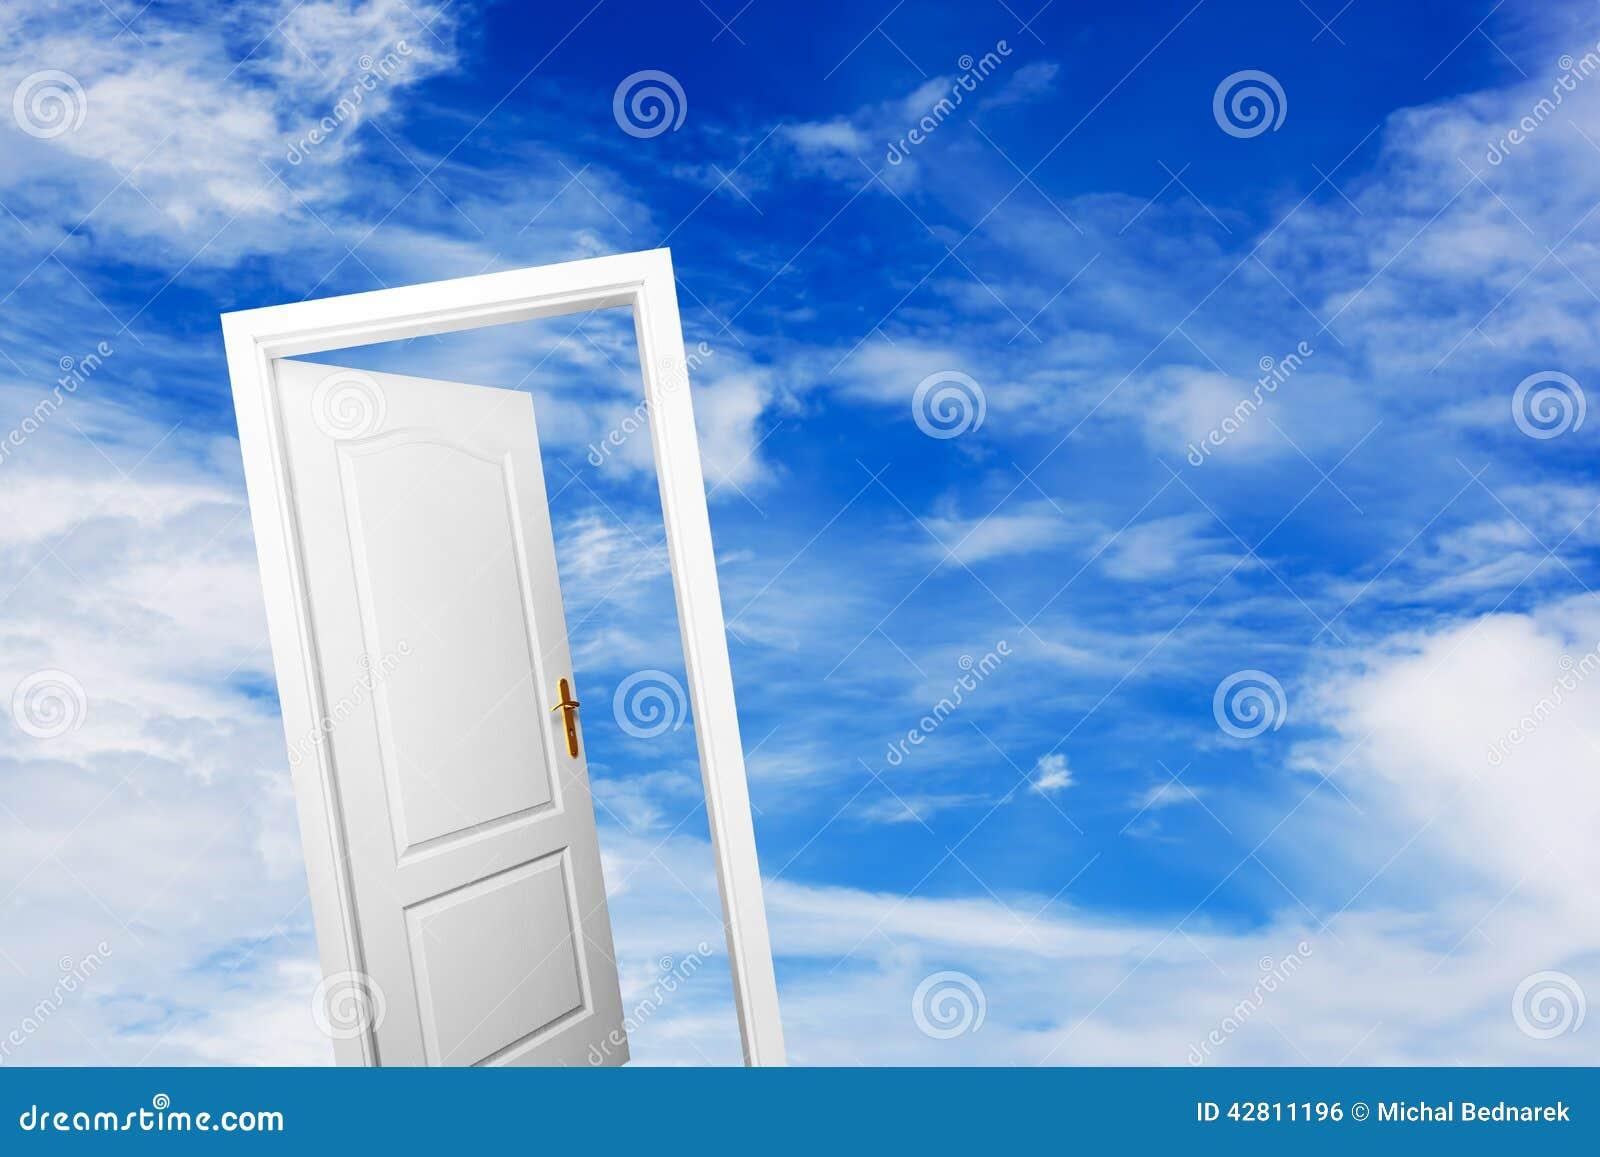 Open door on blue sunny sky. New life, success, hope.